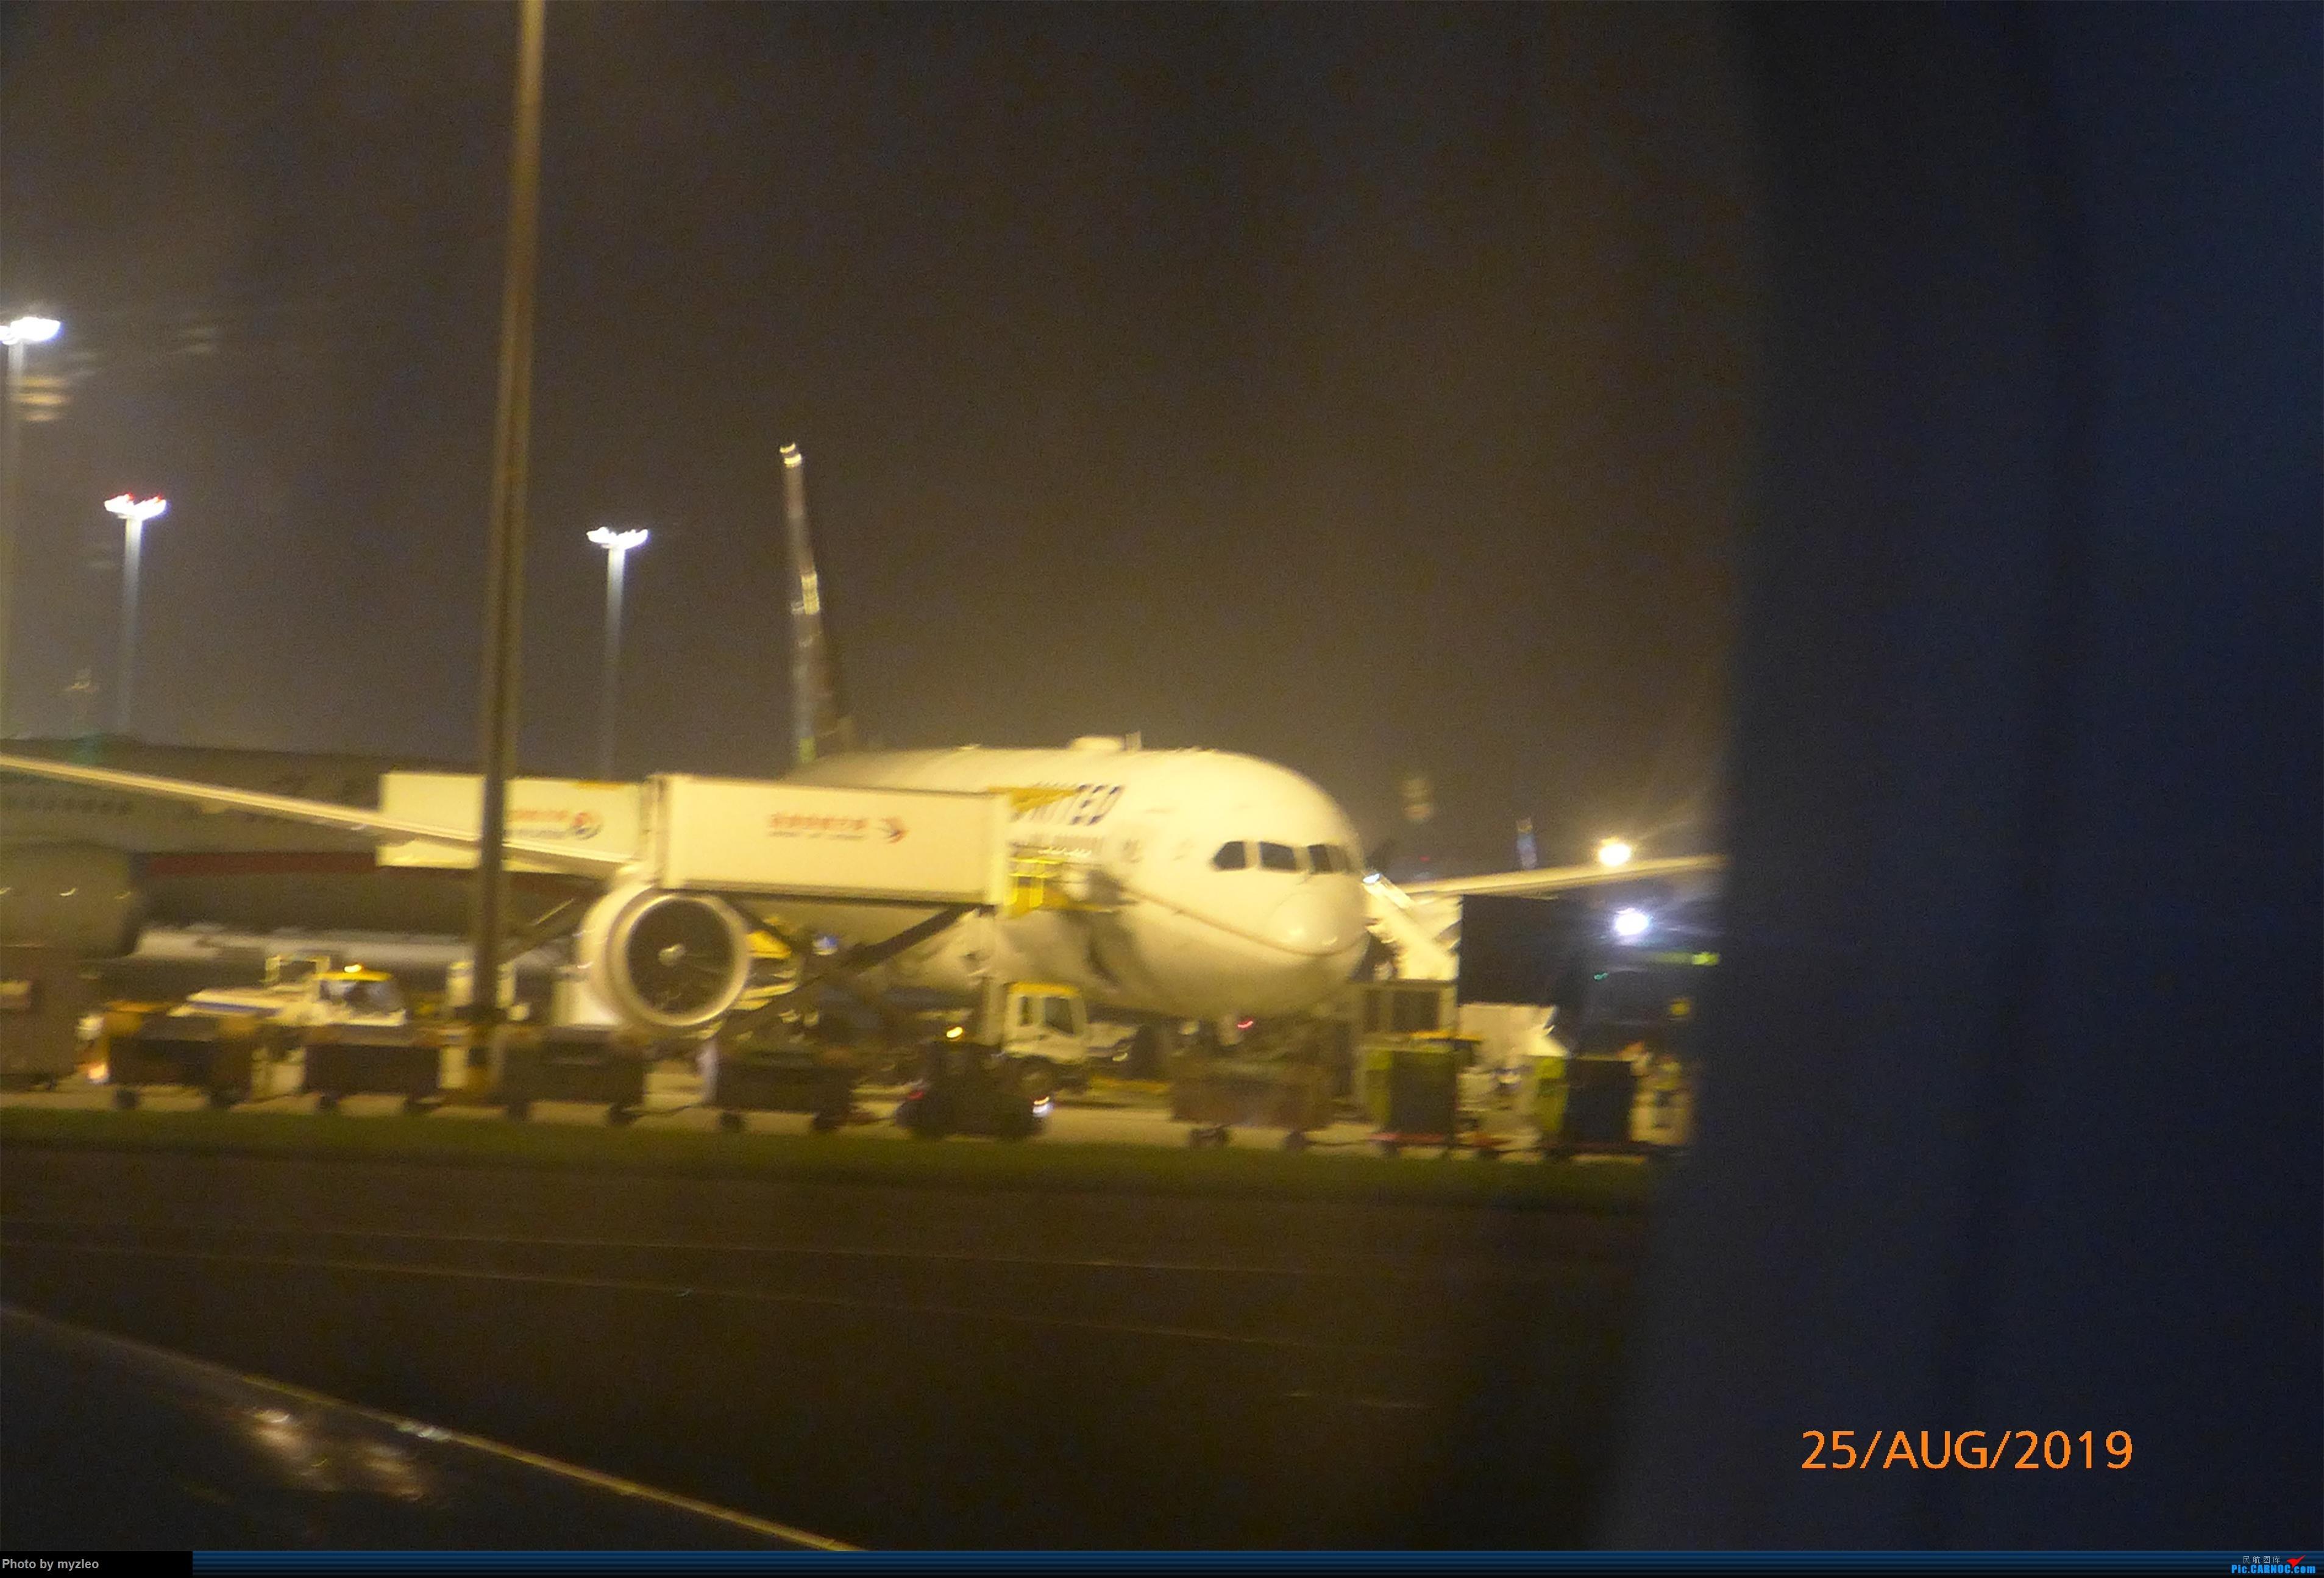 Re:[原创]【myzleo的游记5.3】在大连各景点穿梭不停,坐东航319返回上海 BOEING 787-9  中国上海浦东国际机场